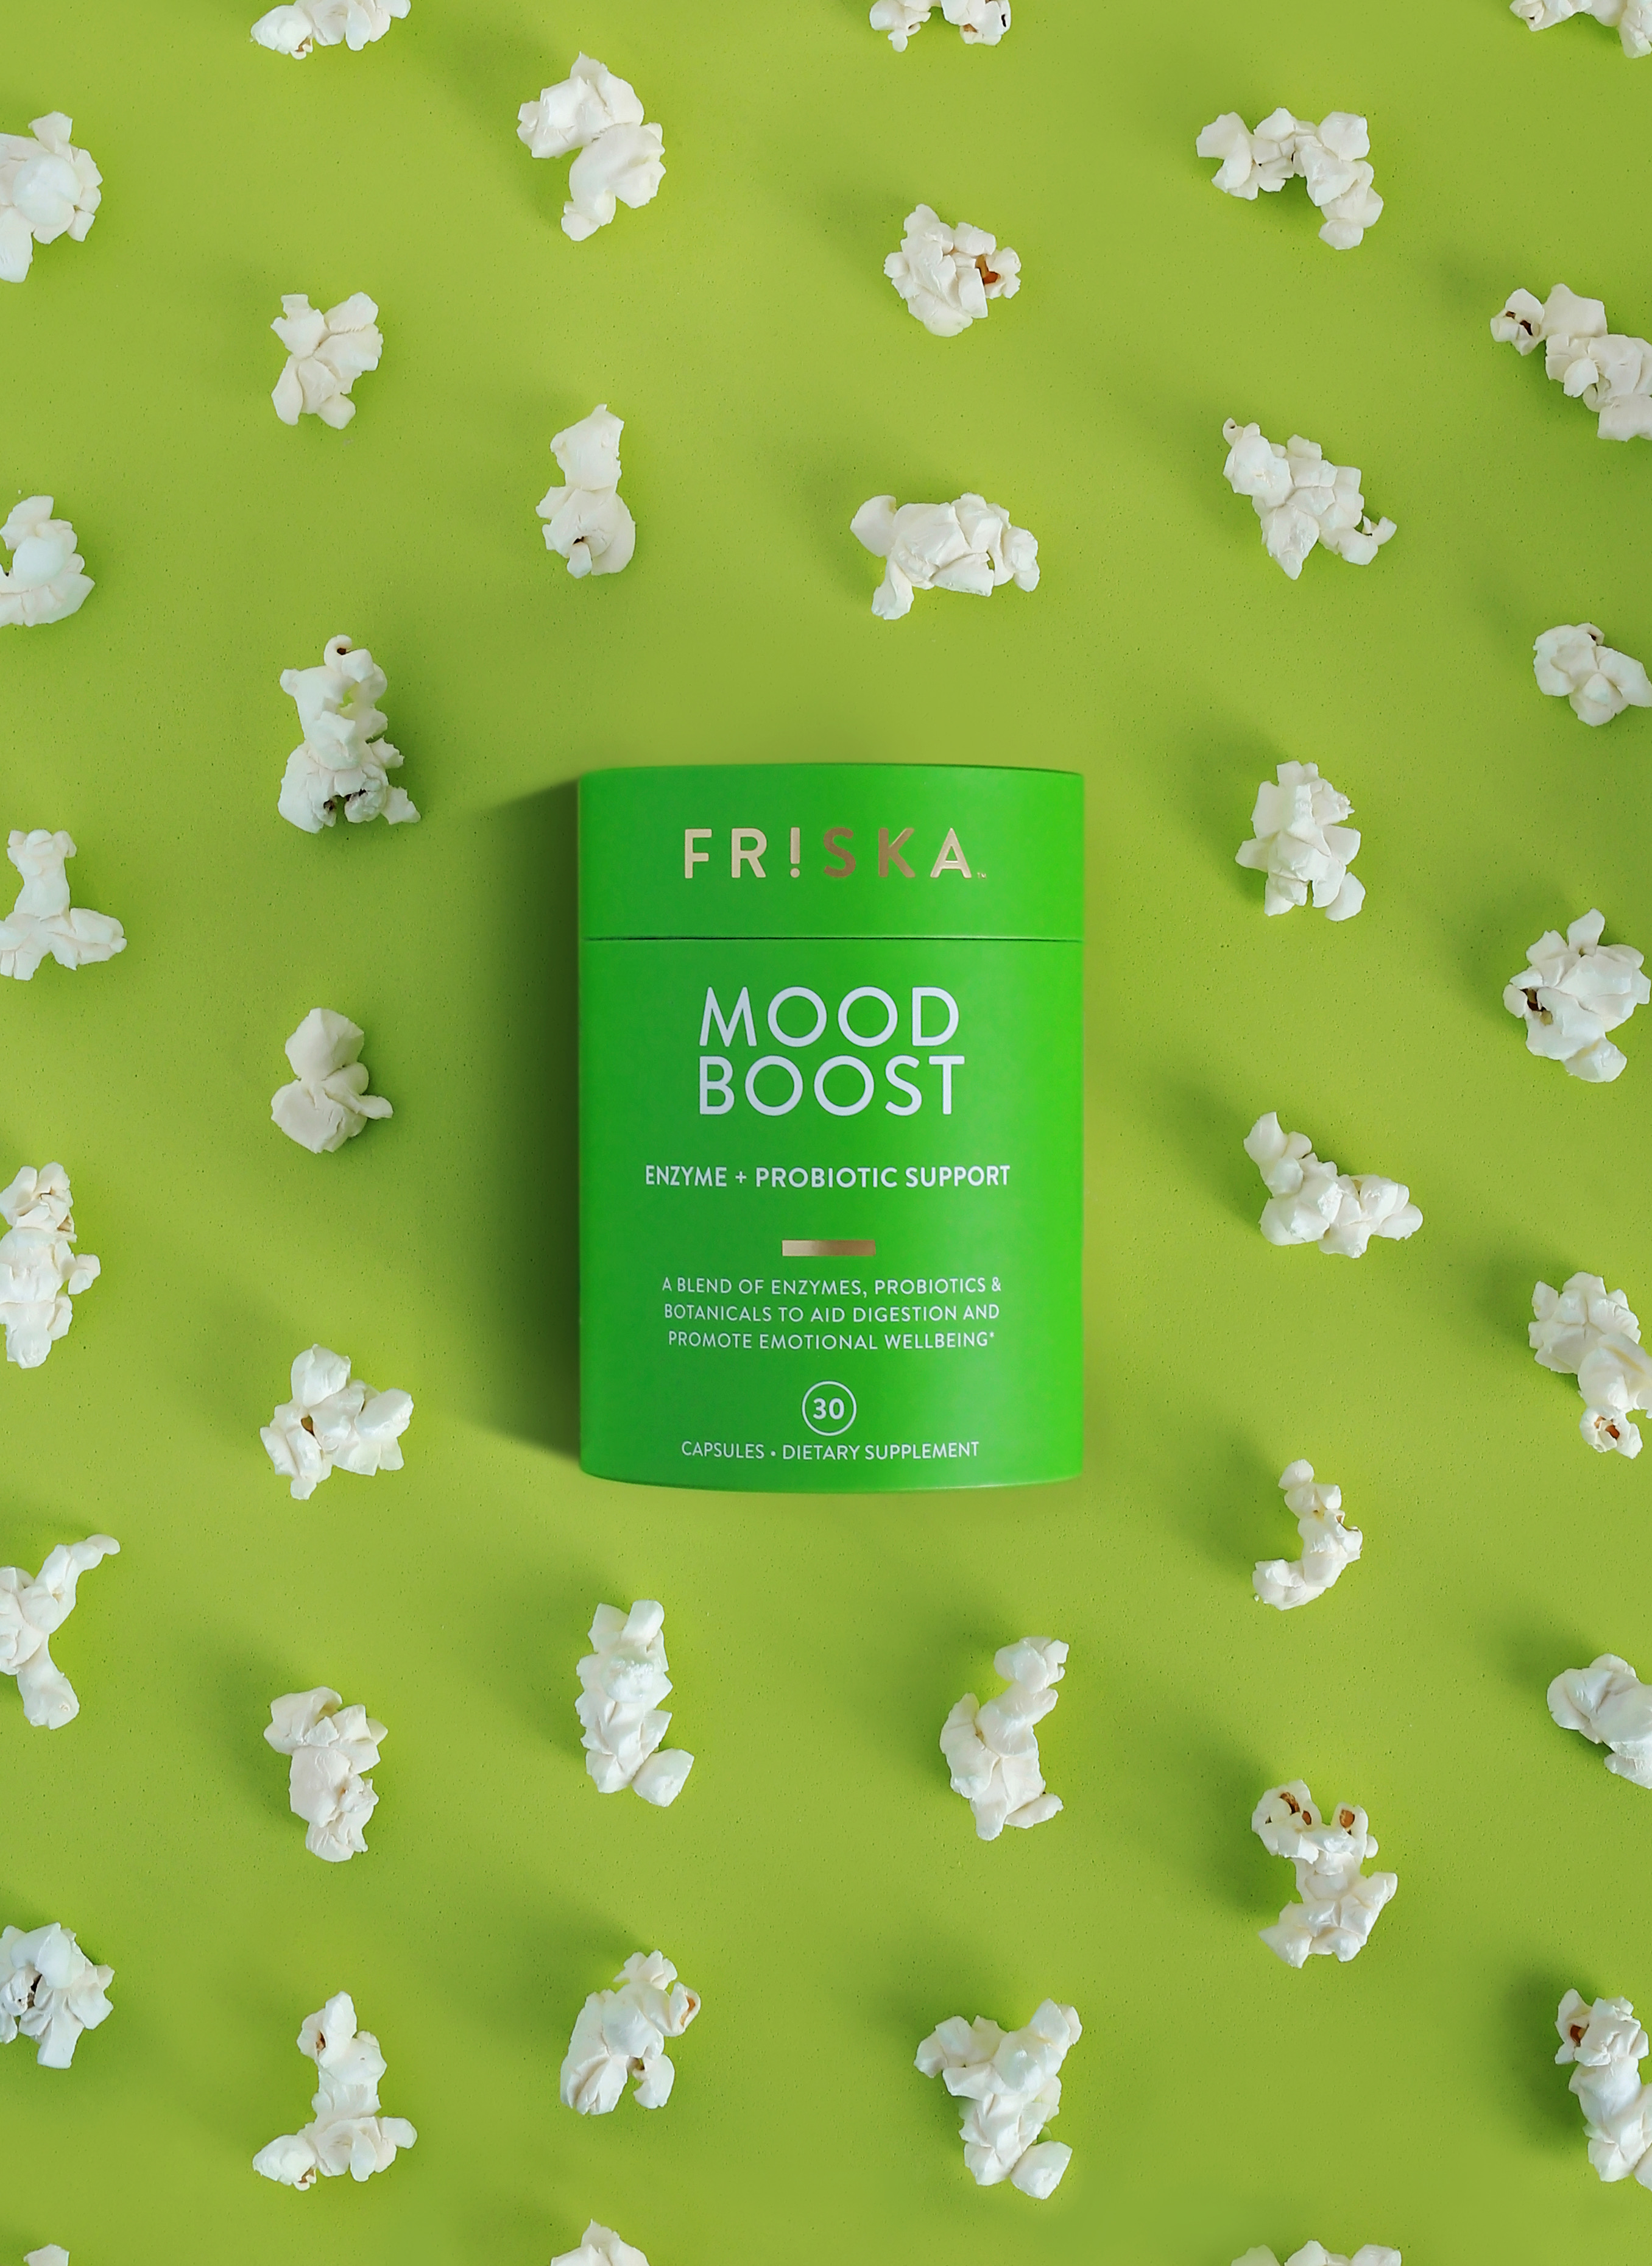 FRISKA - Fresh Packaging Design for your Digestive Health